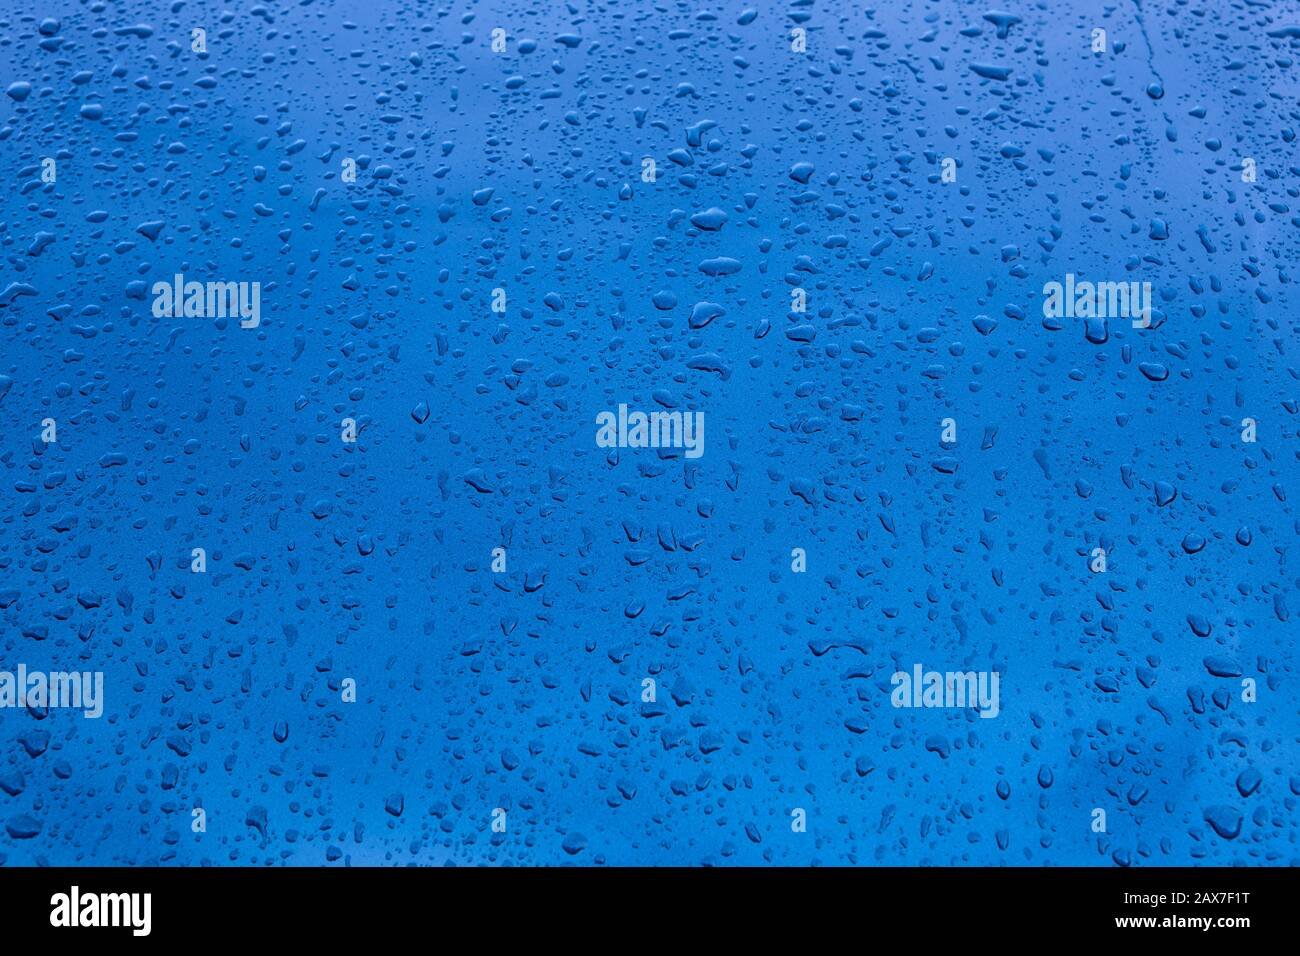 Rain drops on a blue vehicle bodywork. Wet textured background Stock Photo